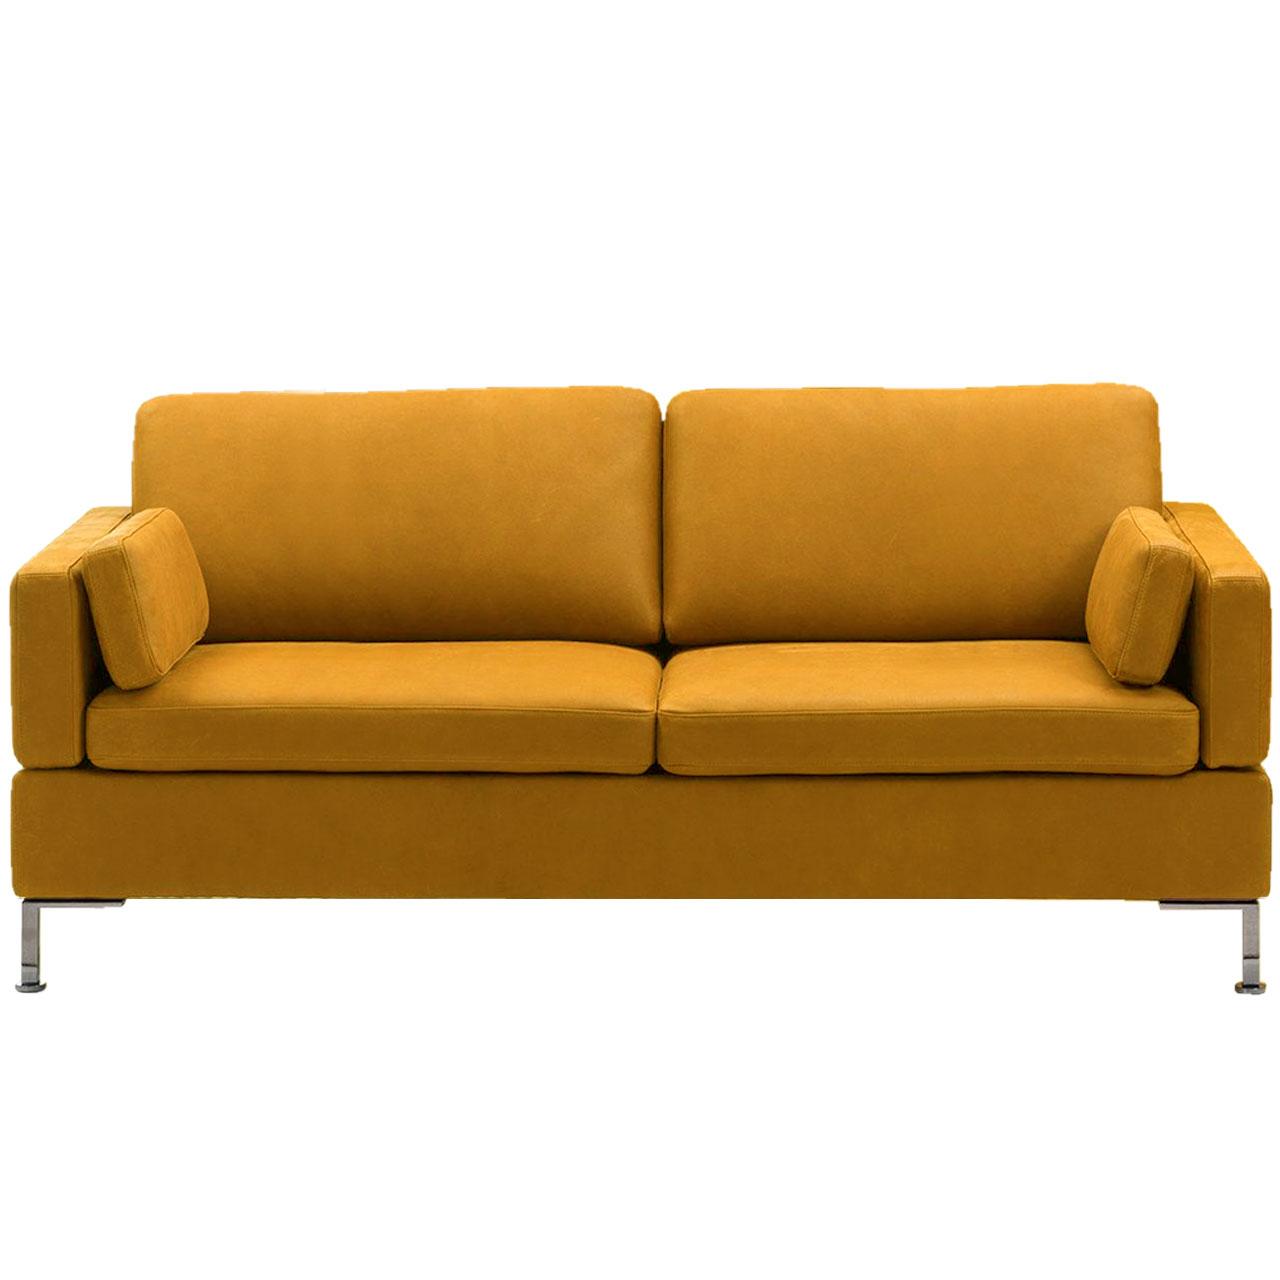 Full Size of Sofa Sitzhöhe 55 Cm Brhl System O 2 55cm Sitztiefe Mbel Shop Stoff Federkern Garten Ecksofa Rattan 2er Grau Wildleder L Form Günstig Kaufen 3 Teilig Mit Sofa Sofa Sitzhöhe 55 Cm